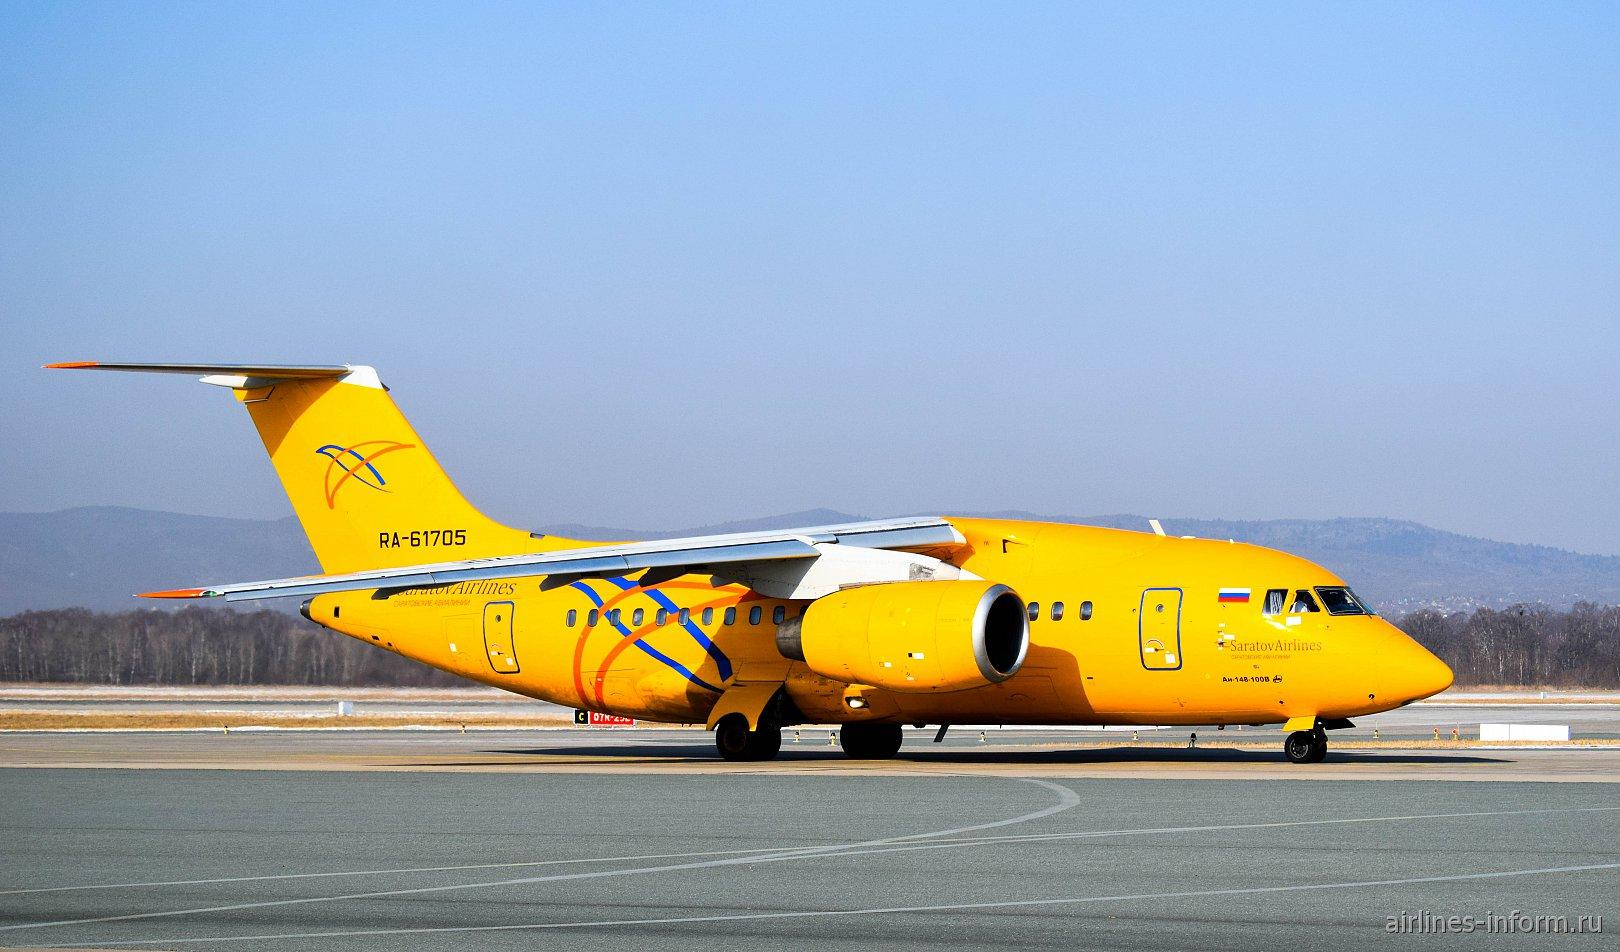 Самолет Ан-148 RA-61705 Саратовских авиалиний в аэропорту Владивостока